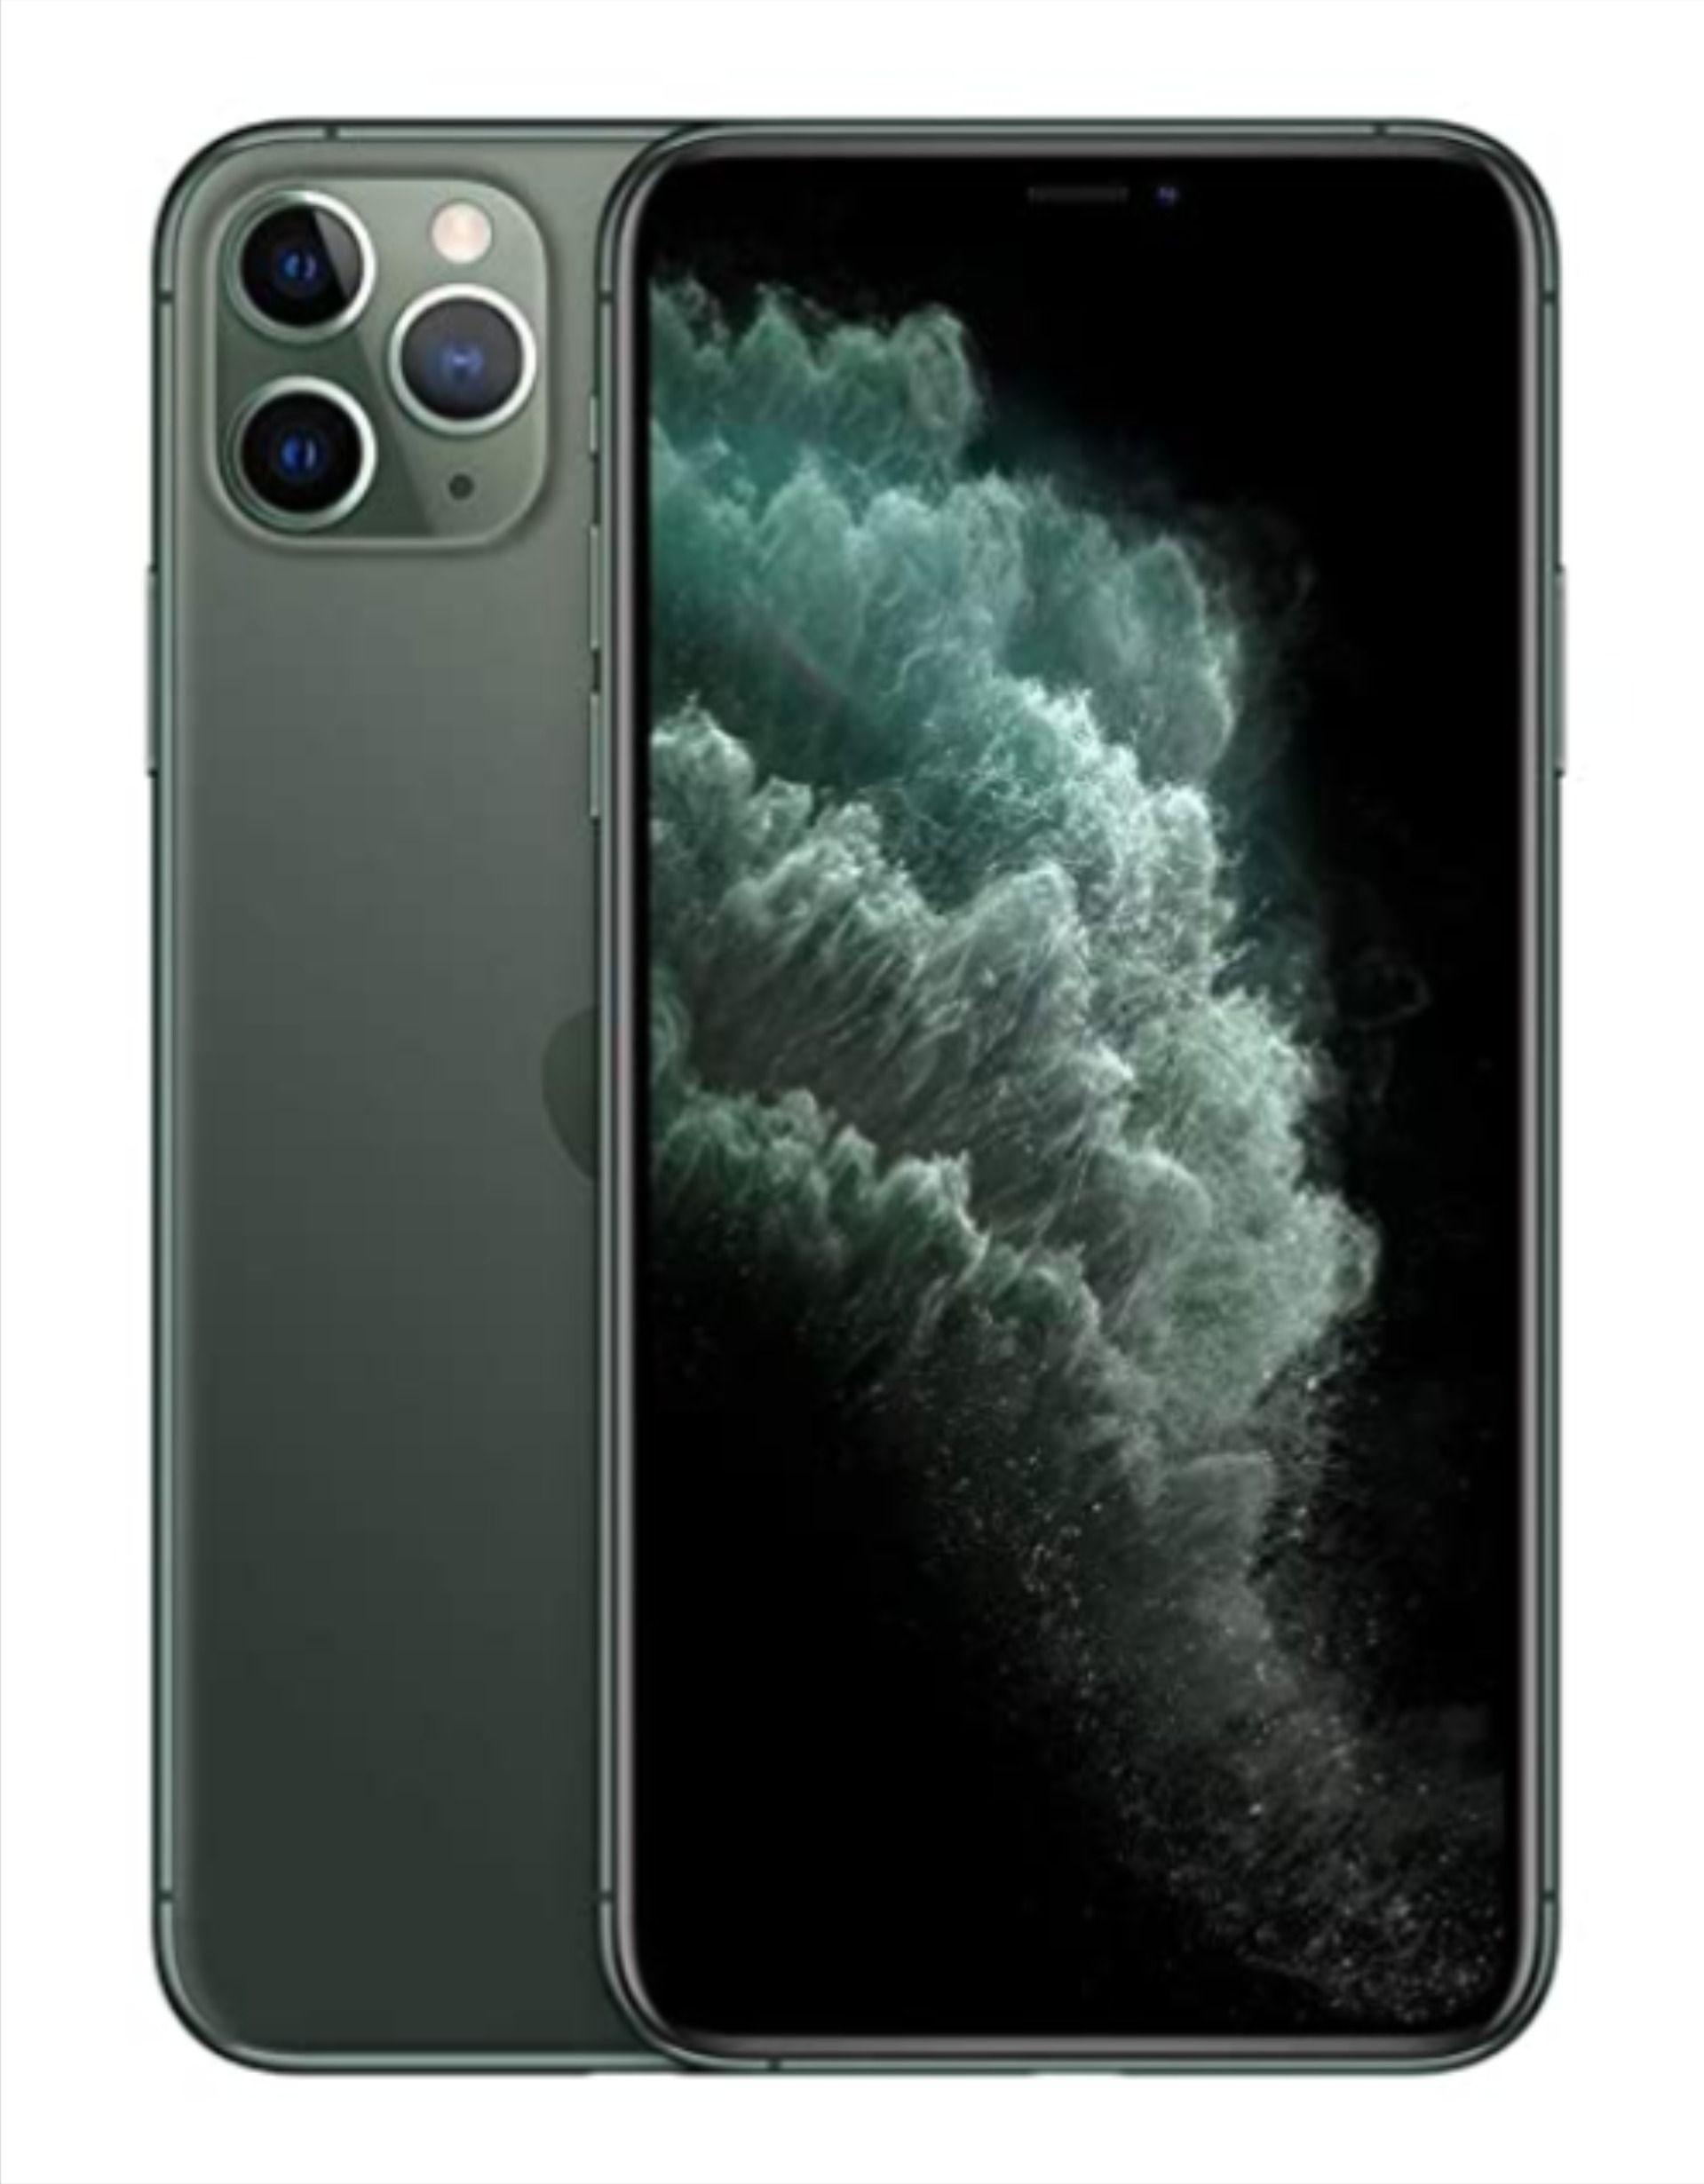 Apple iphone 11 pro max 64gb midnight green in 2020